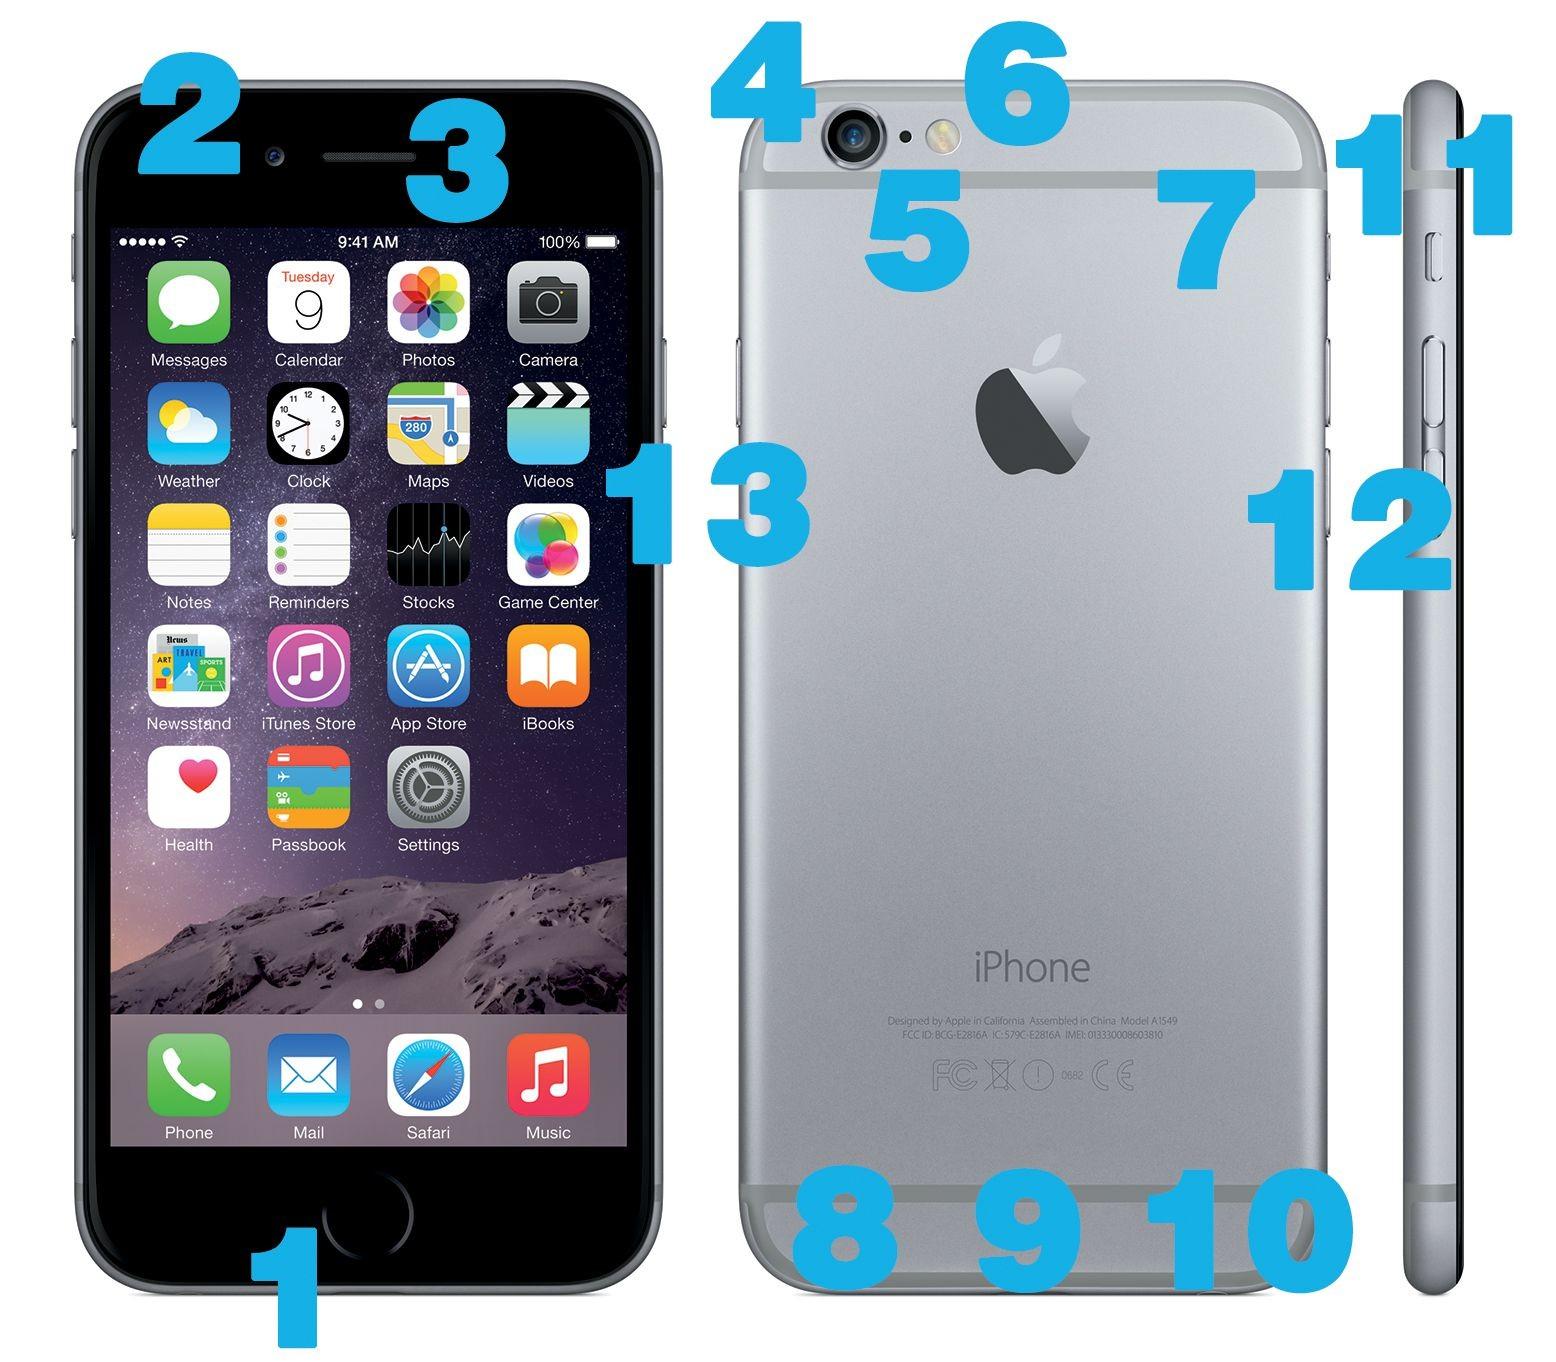 iphone 6 anatomy 56a f9b58b7d0db81e7